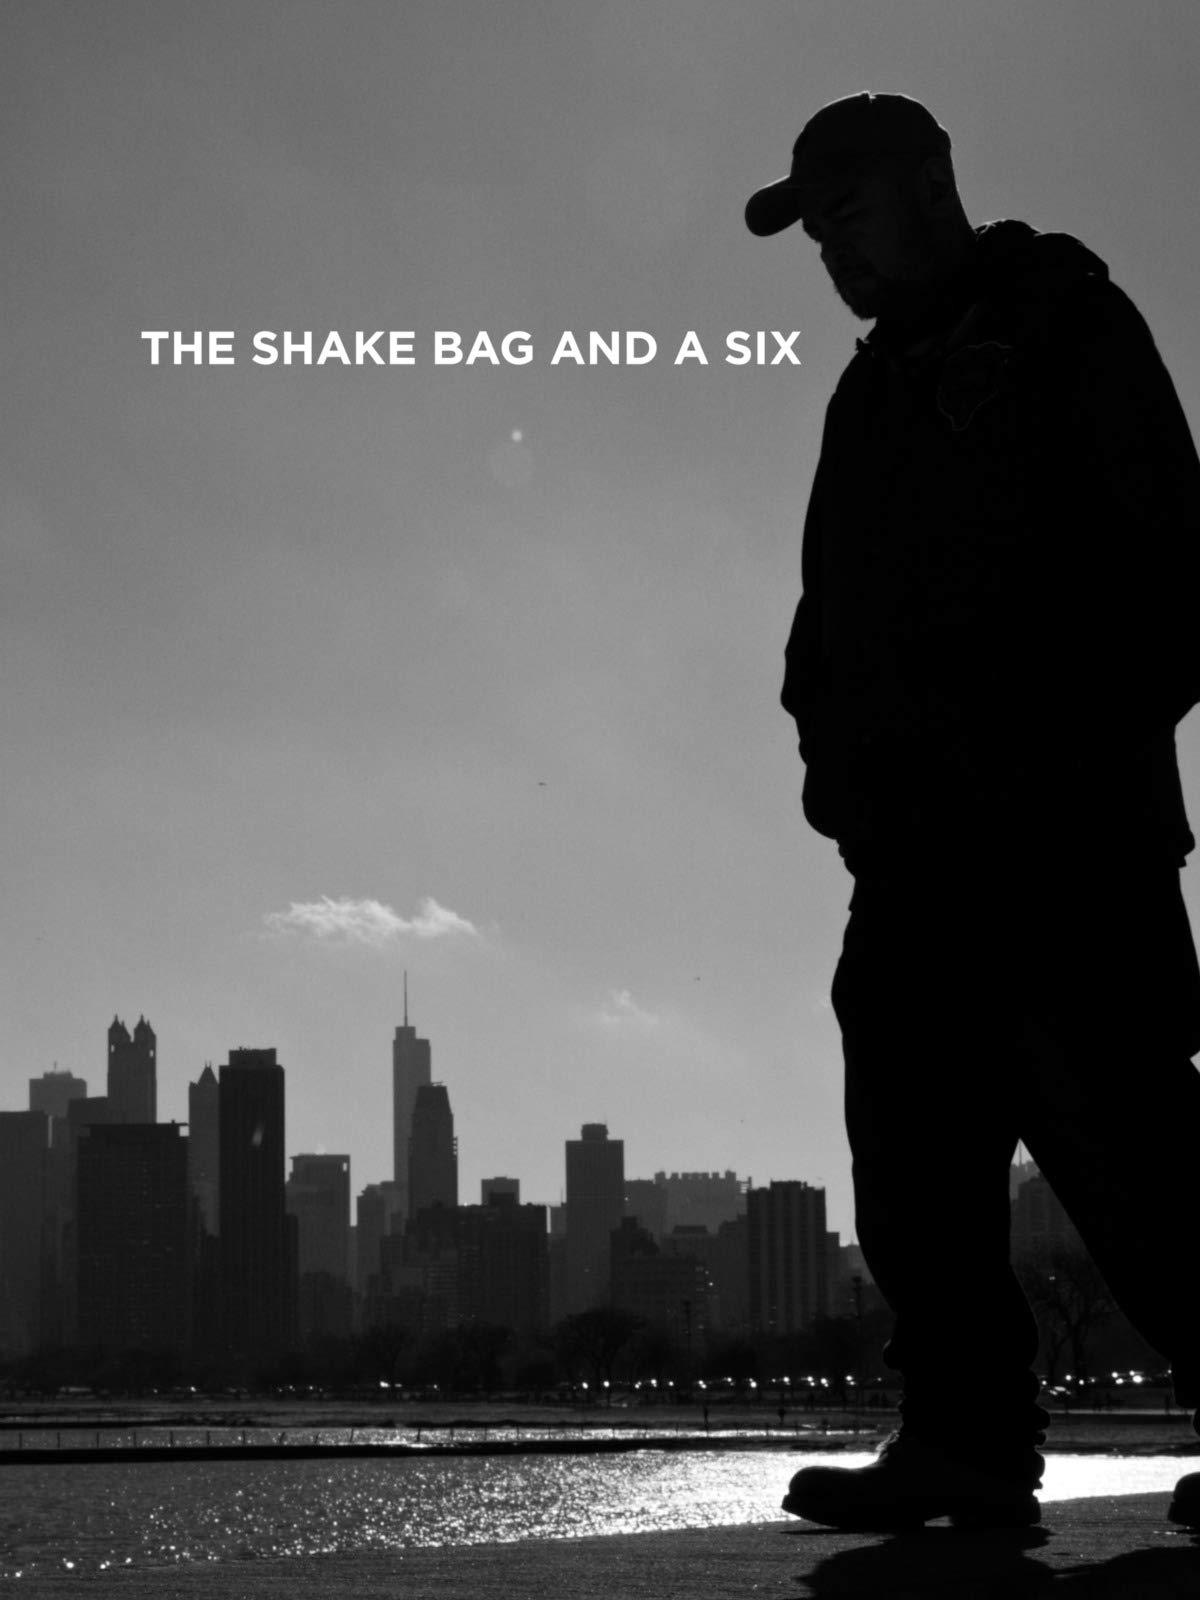 The Shakebag and a Six